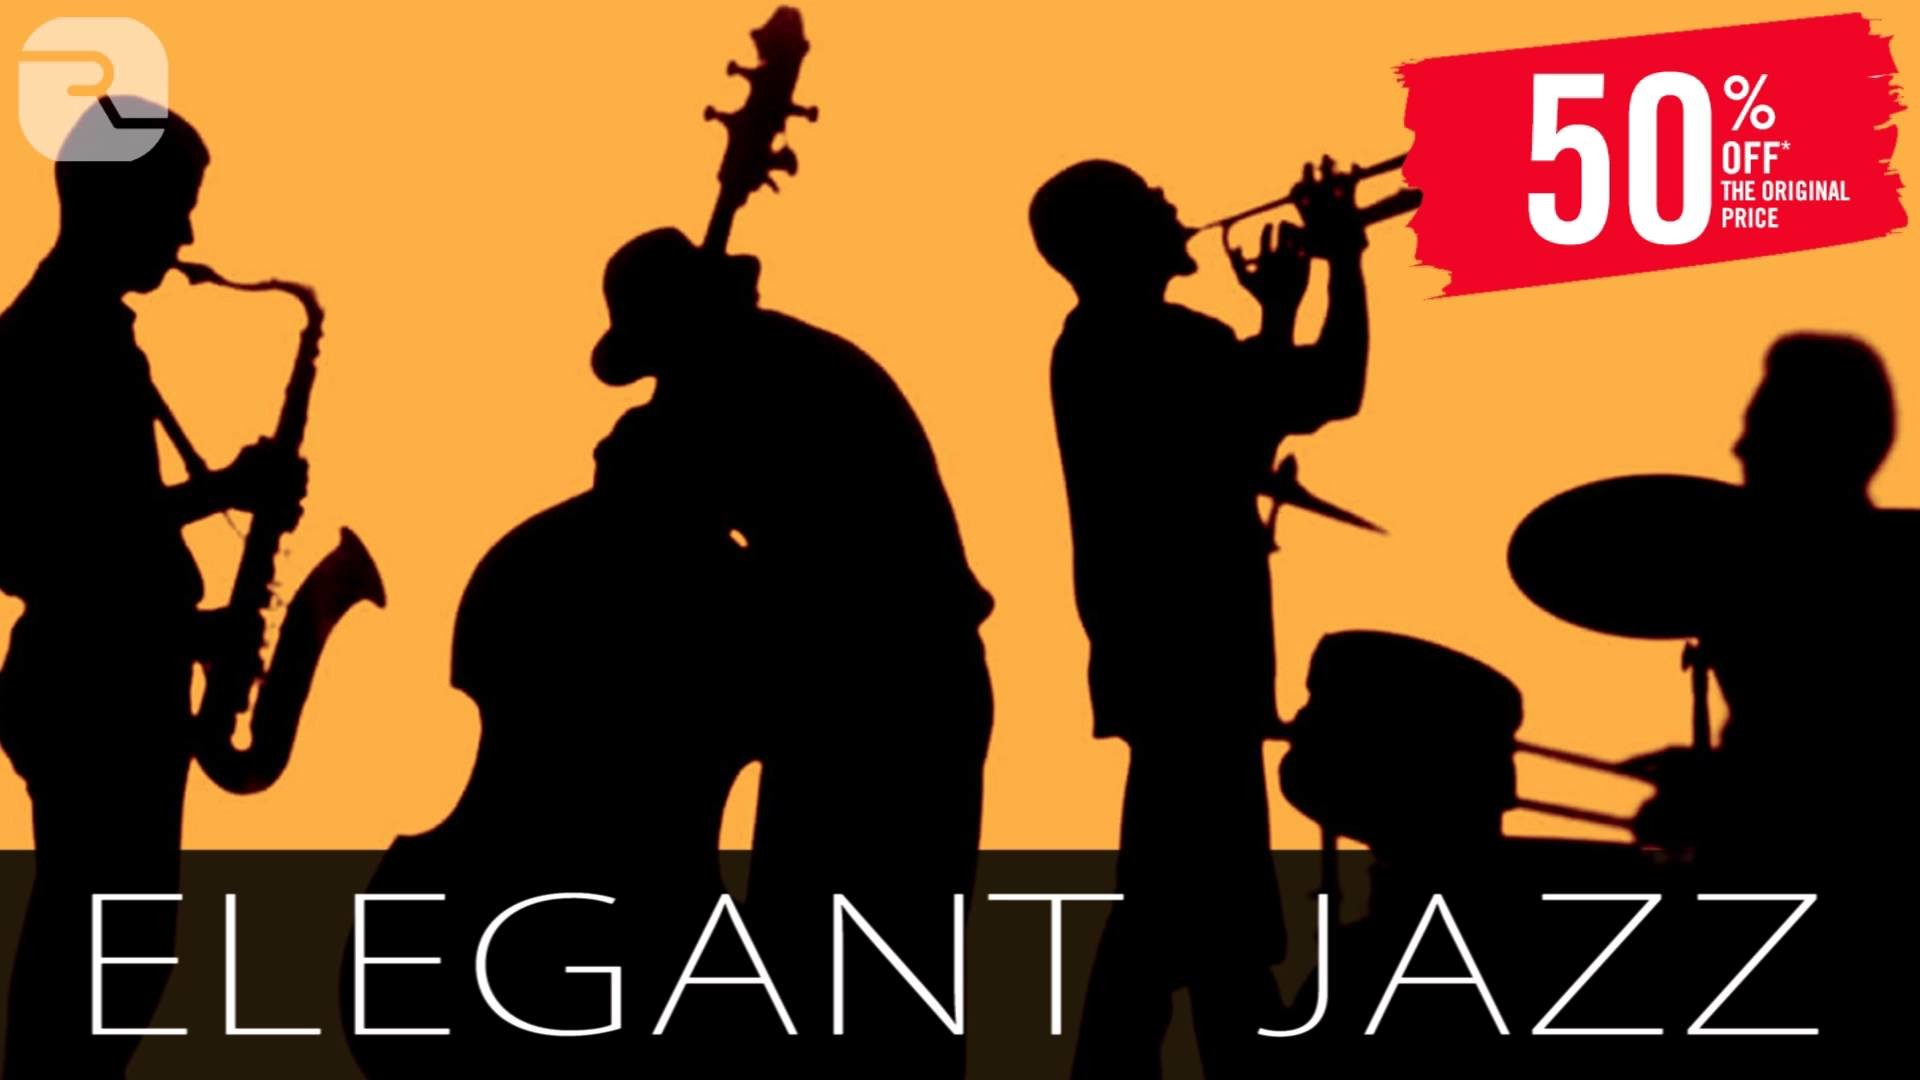 Elegant Jazz Background Music for Videos